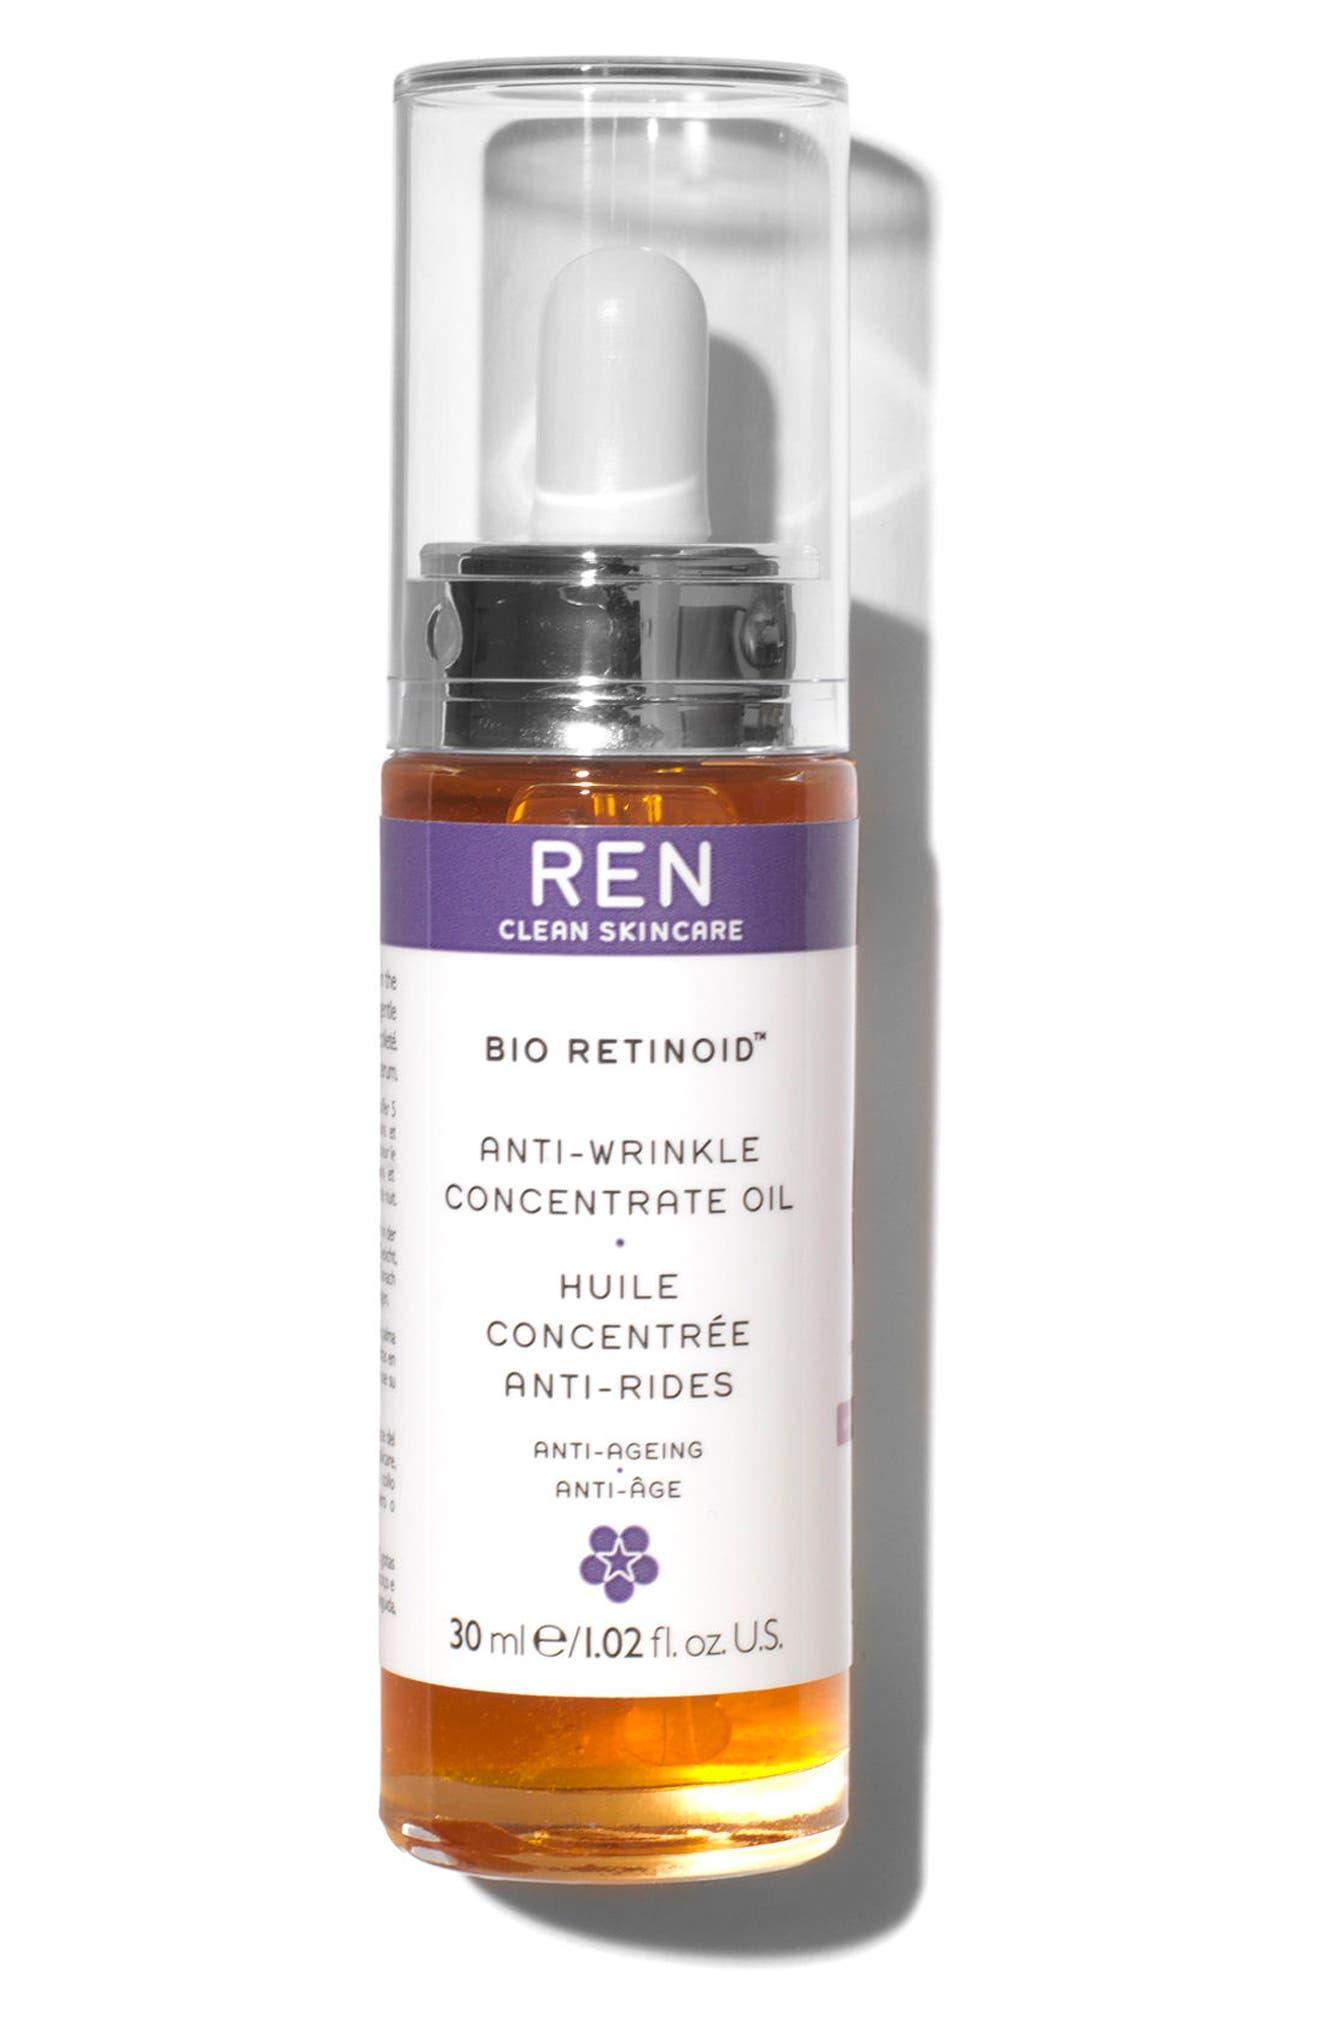 REN Bio Retinoid Anti-Wrinkle Concentrate Oil | Nordstrom